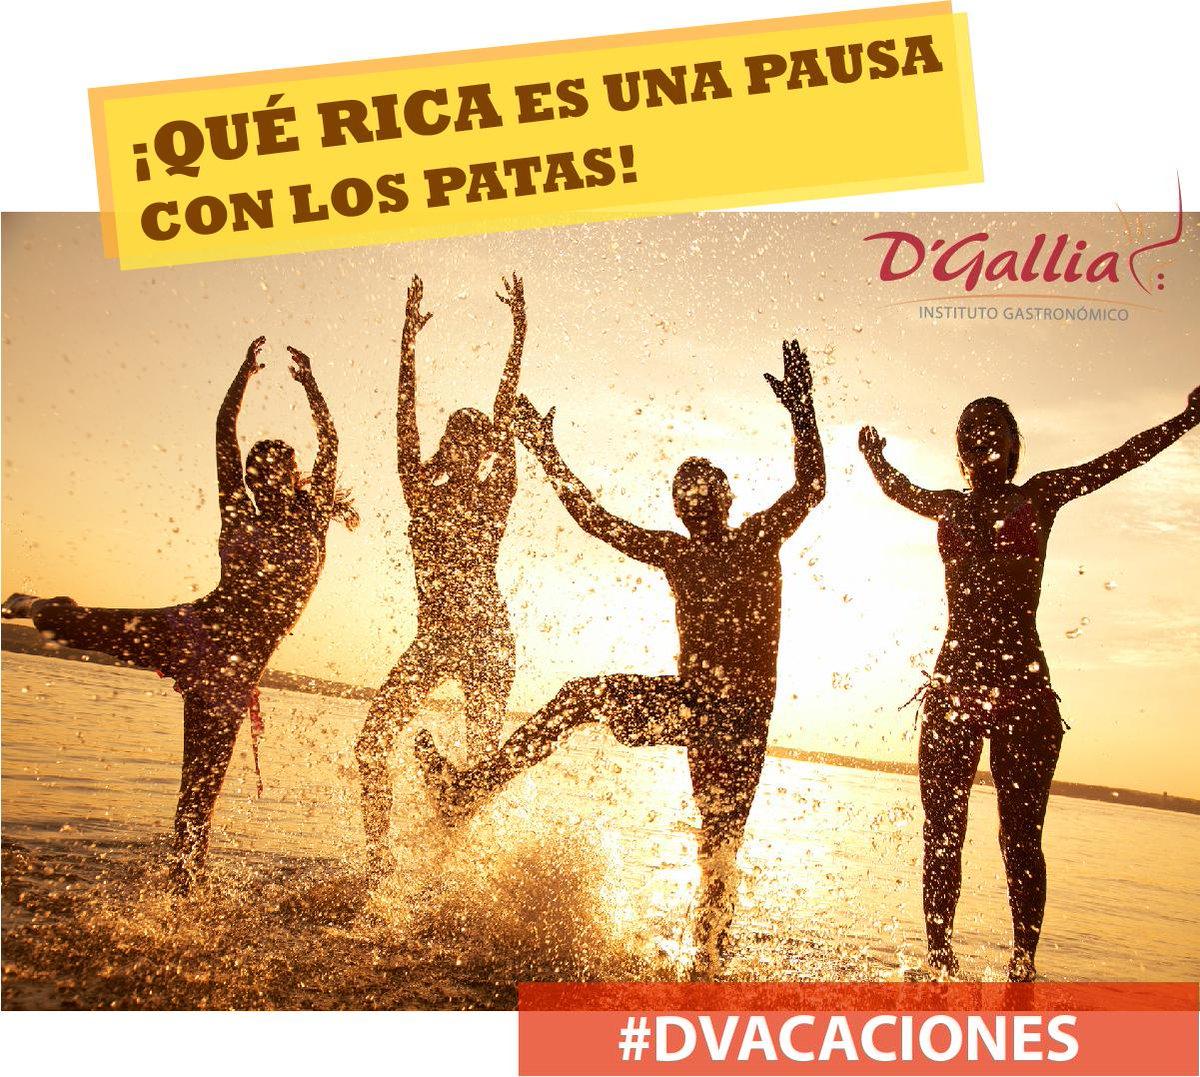 #relax #dvacaciones :D http://t.co/Zm4ou1jkOU